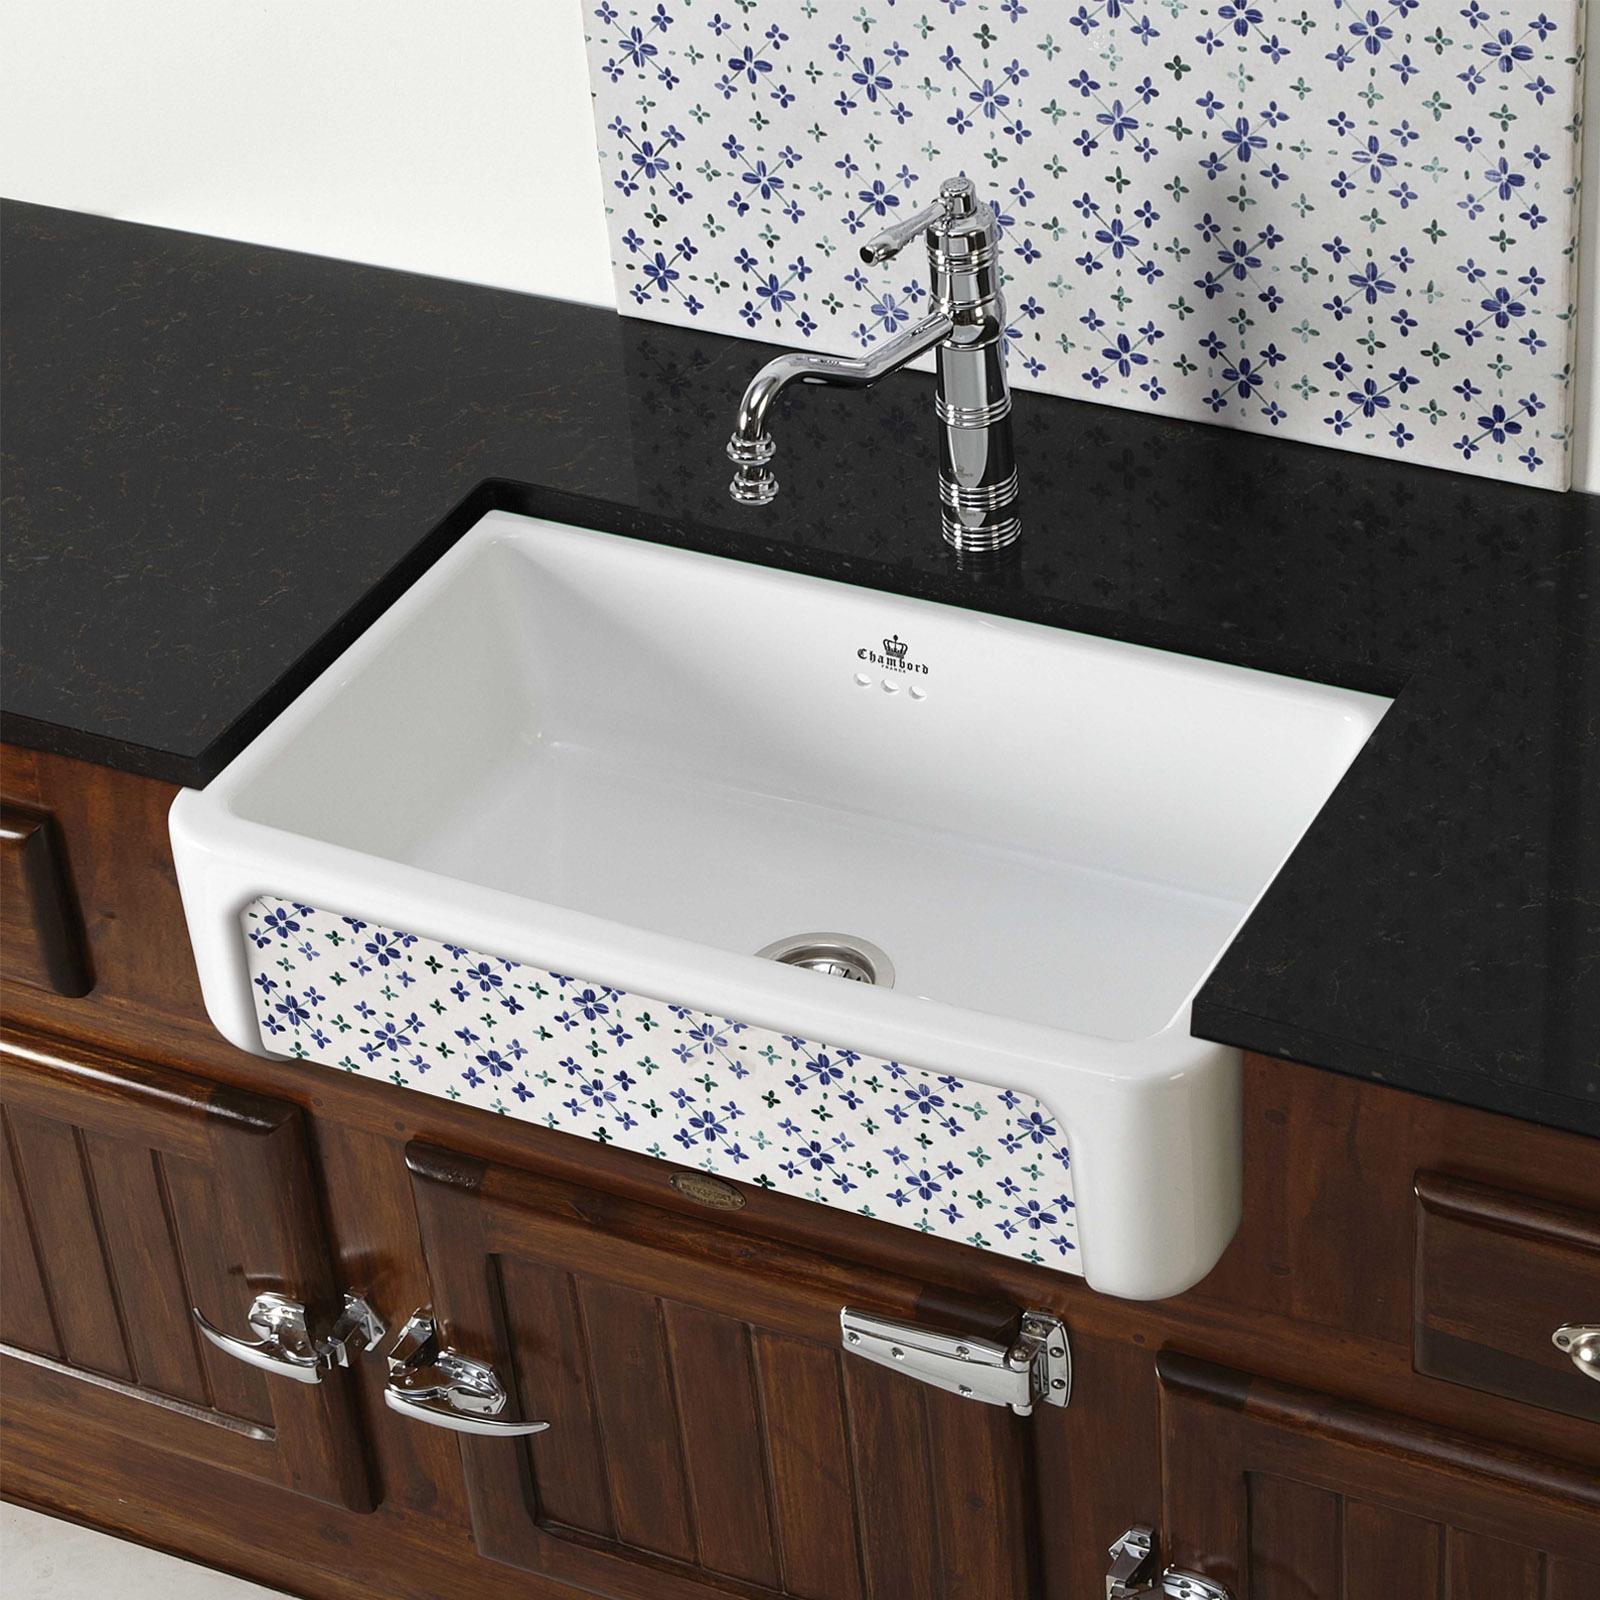 High-quality sink Henri II Bretagne - single bowl, decorated ceramic - ambience 2